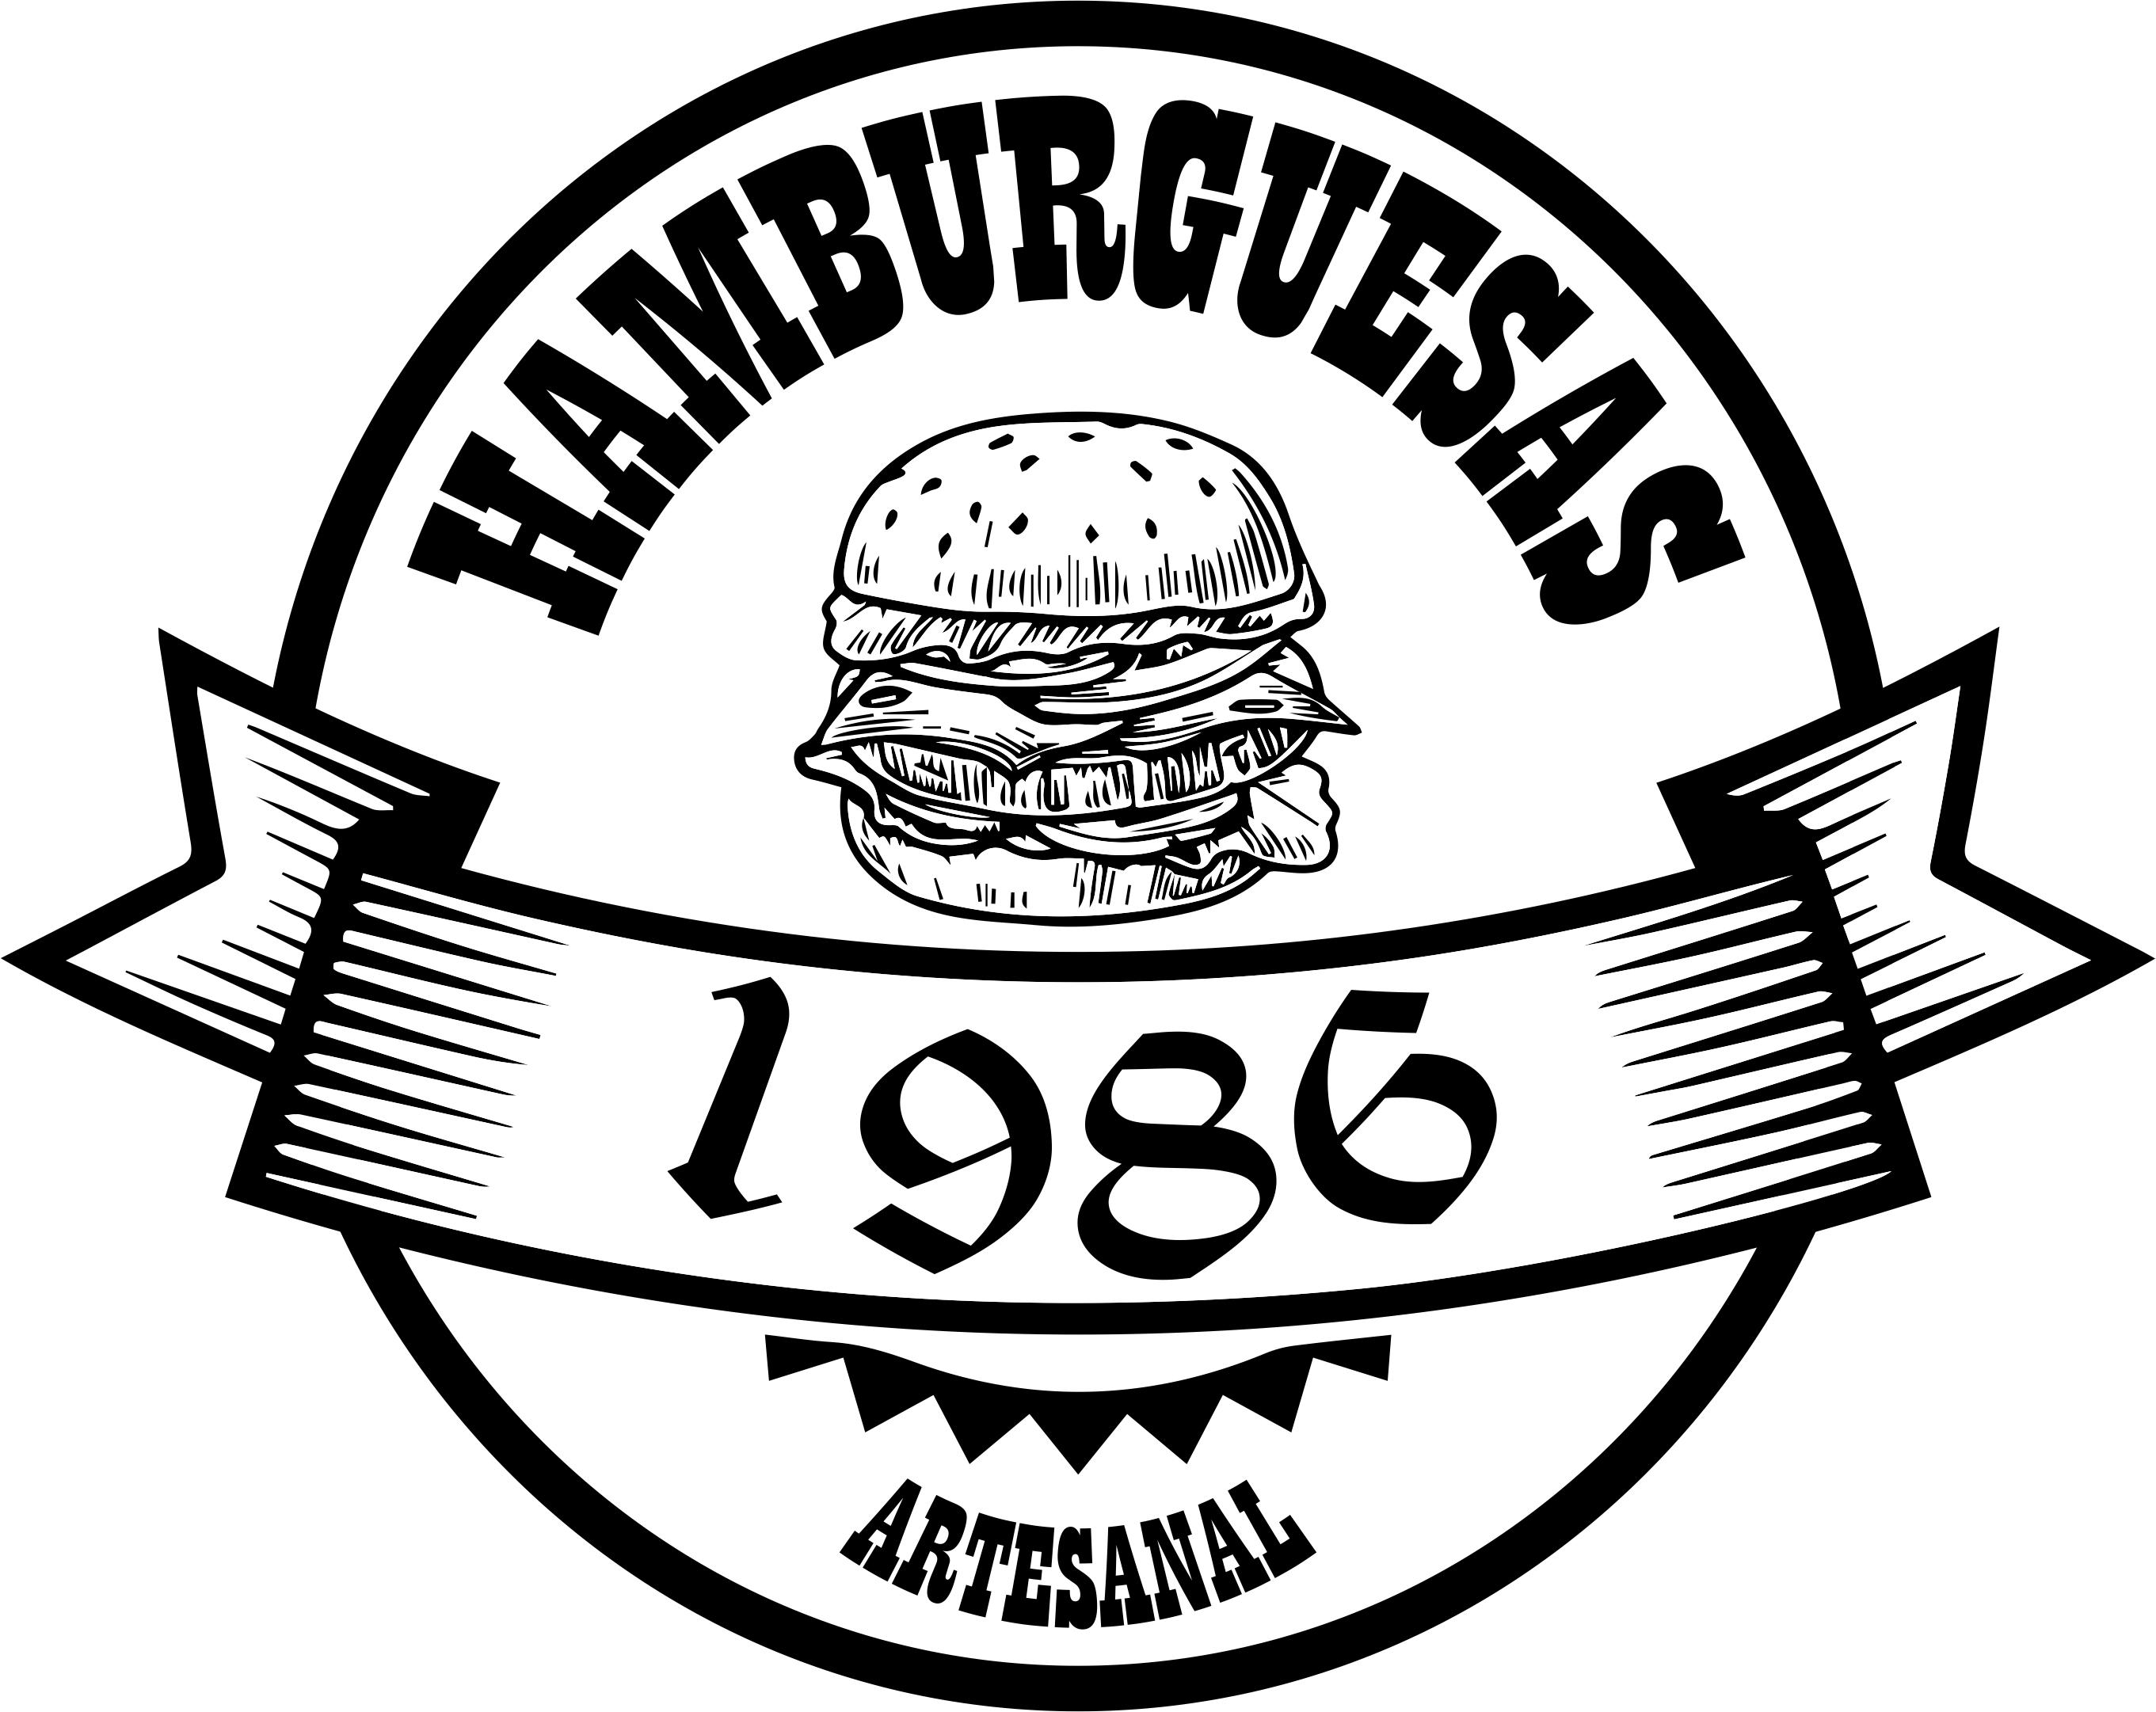 Hamburguesa 1986 Artesanal